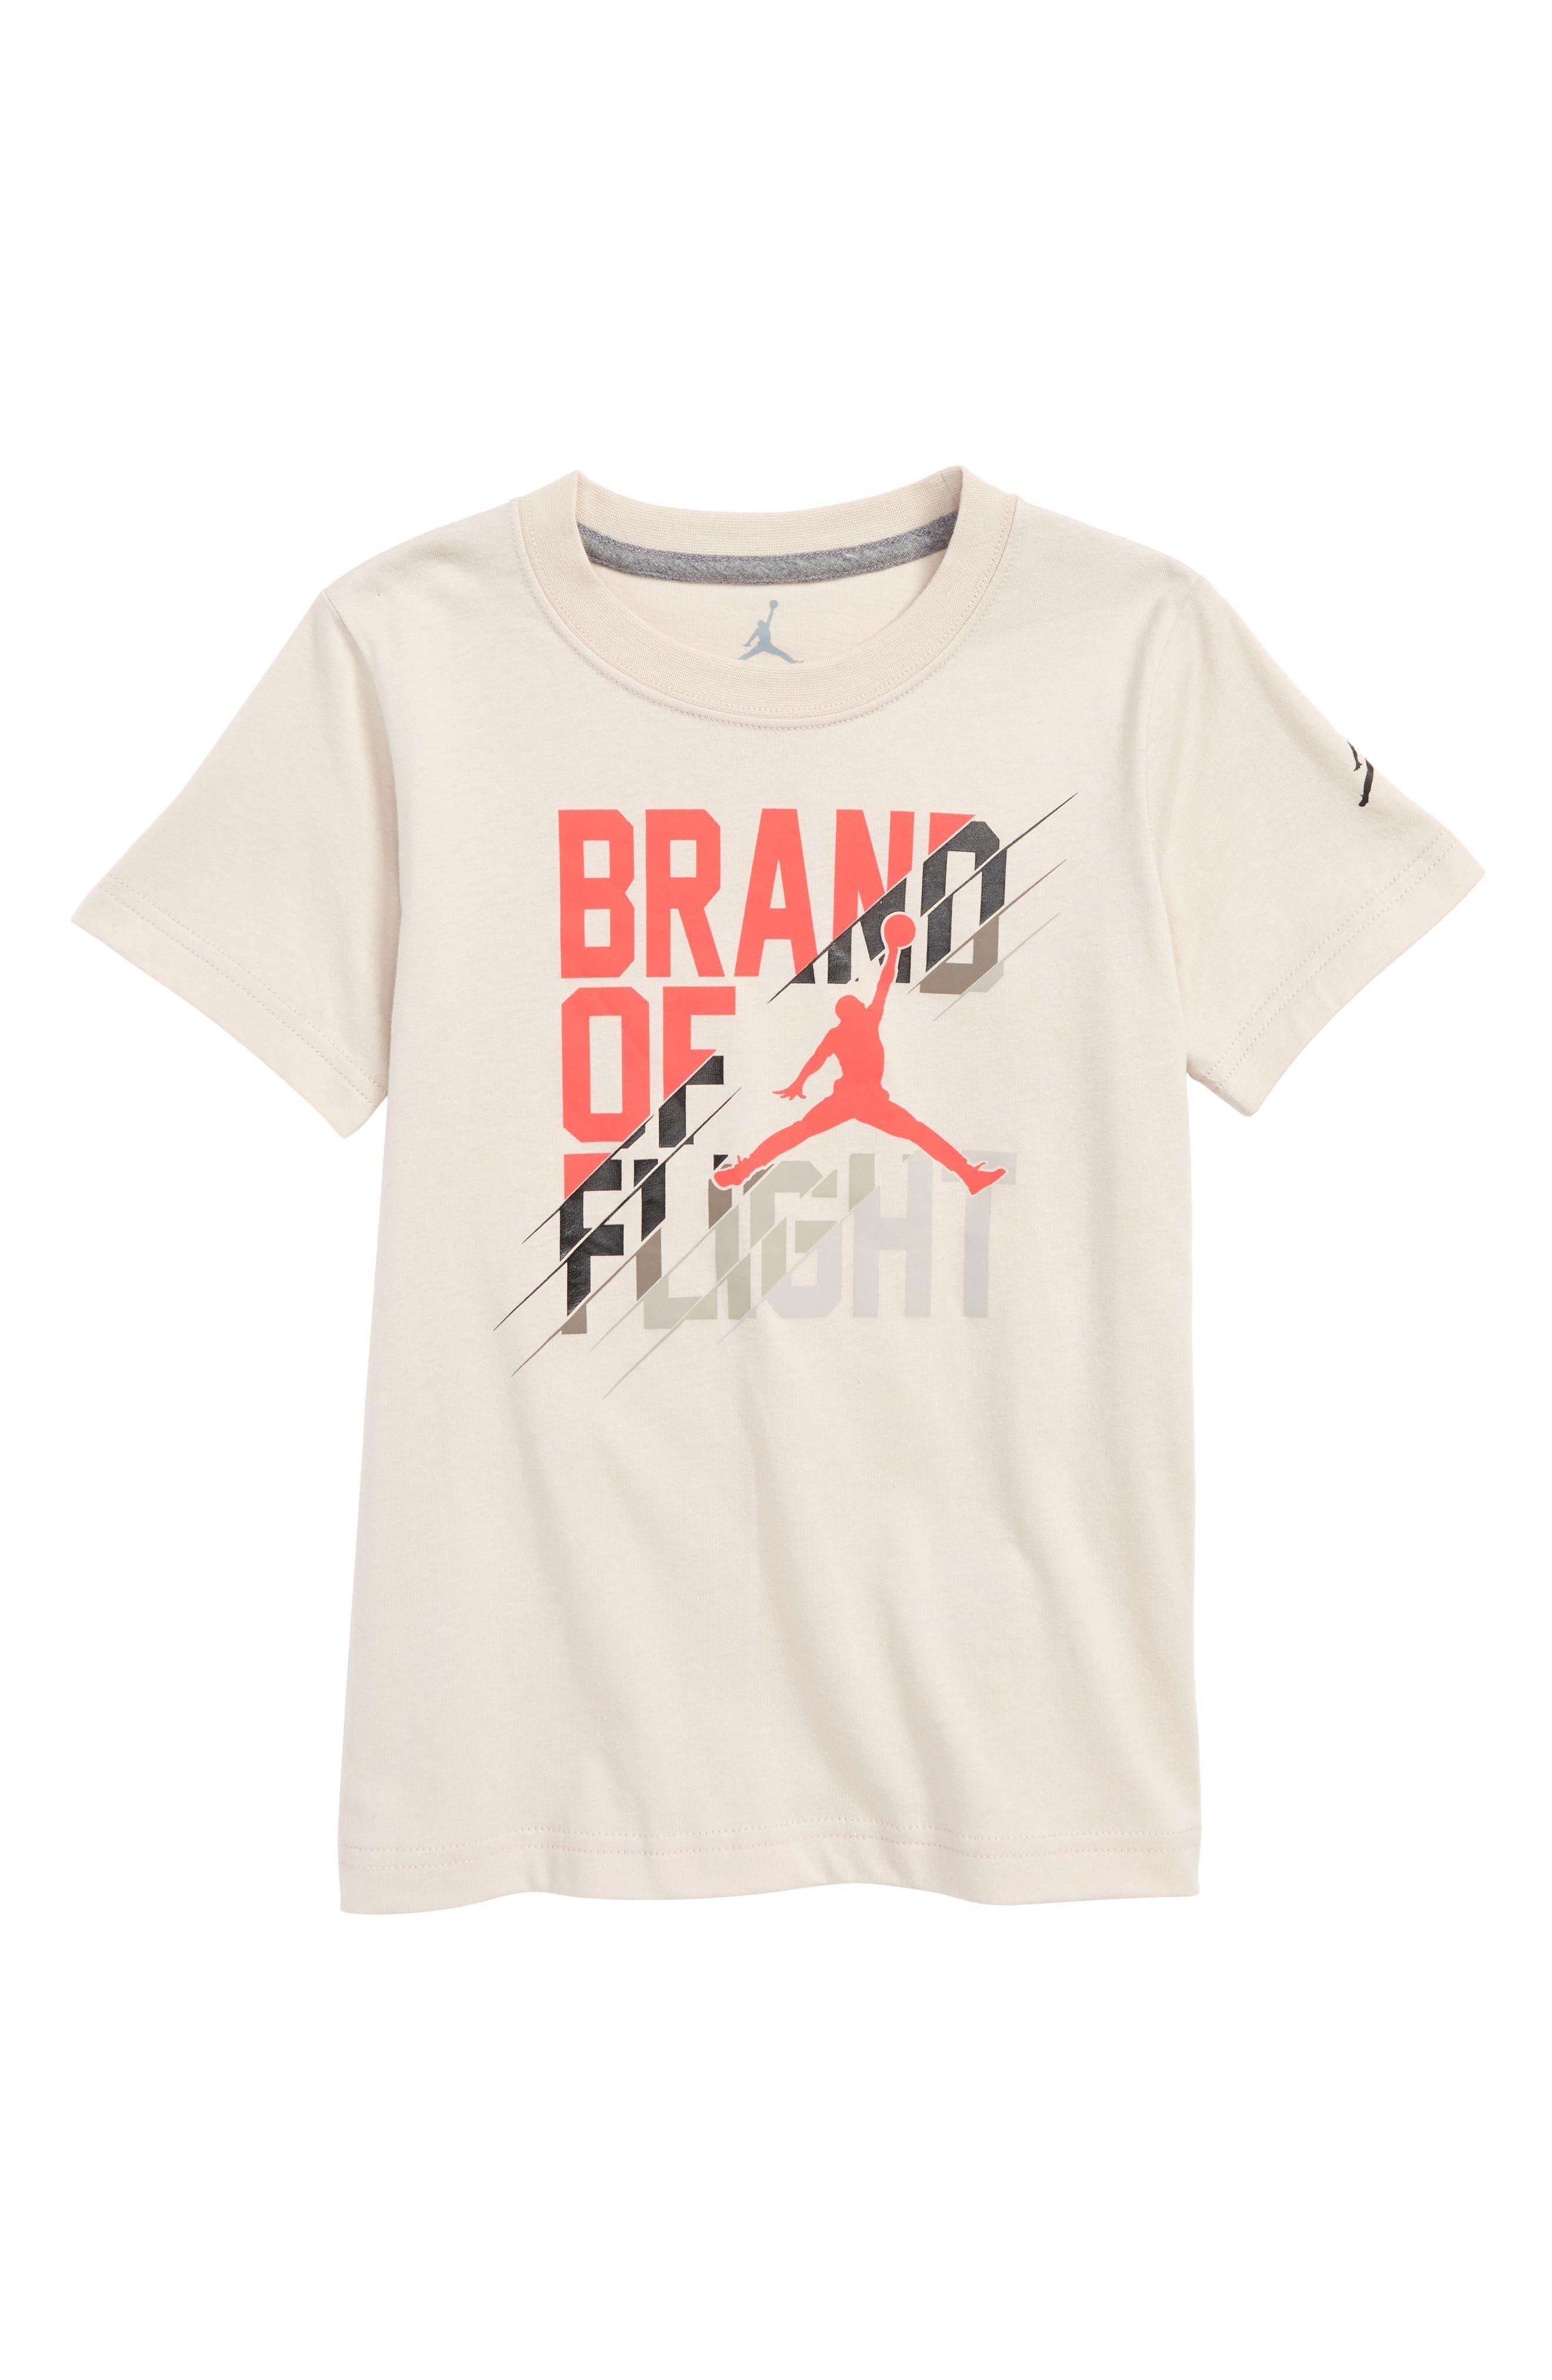 Jordan Cut to the Rim T-Shirt,                         Main,                         color, Desert Sand